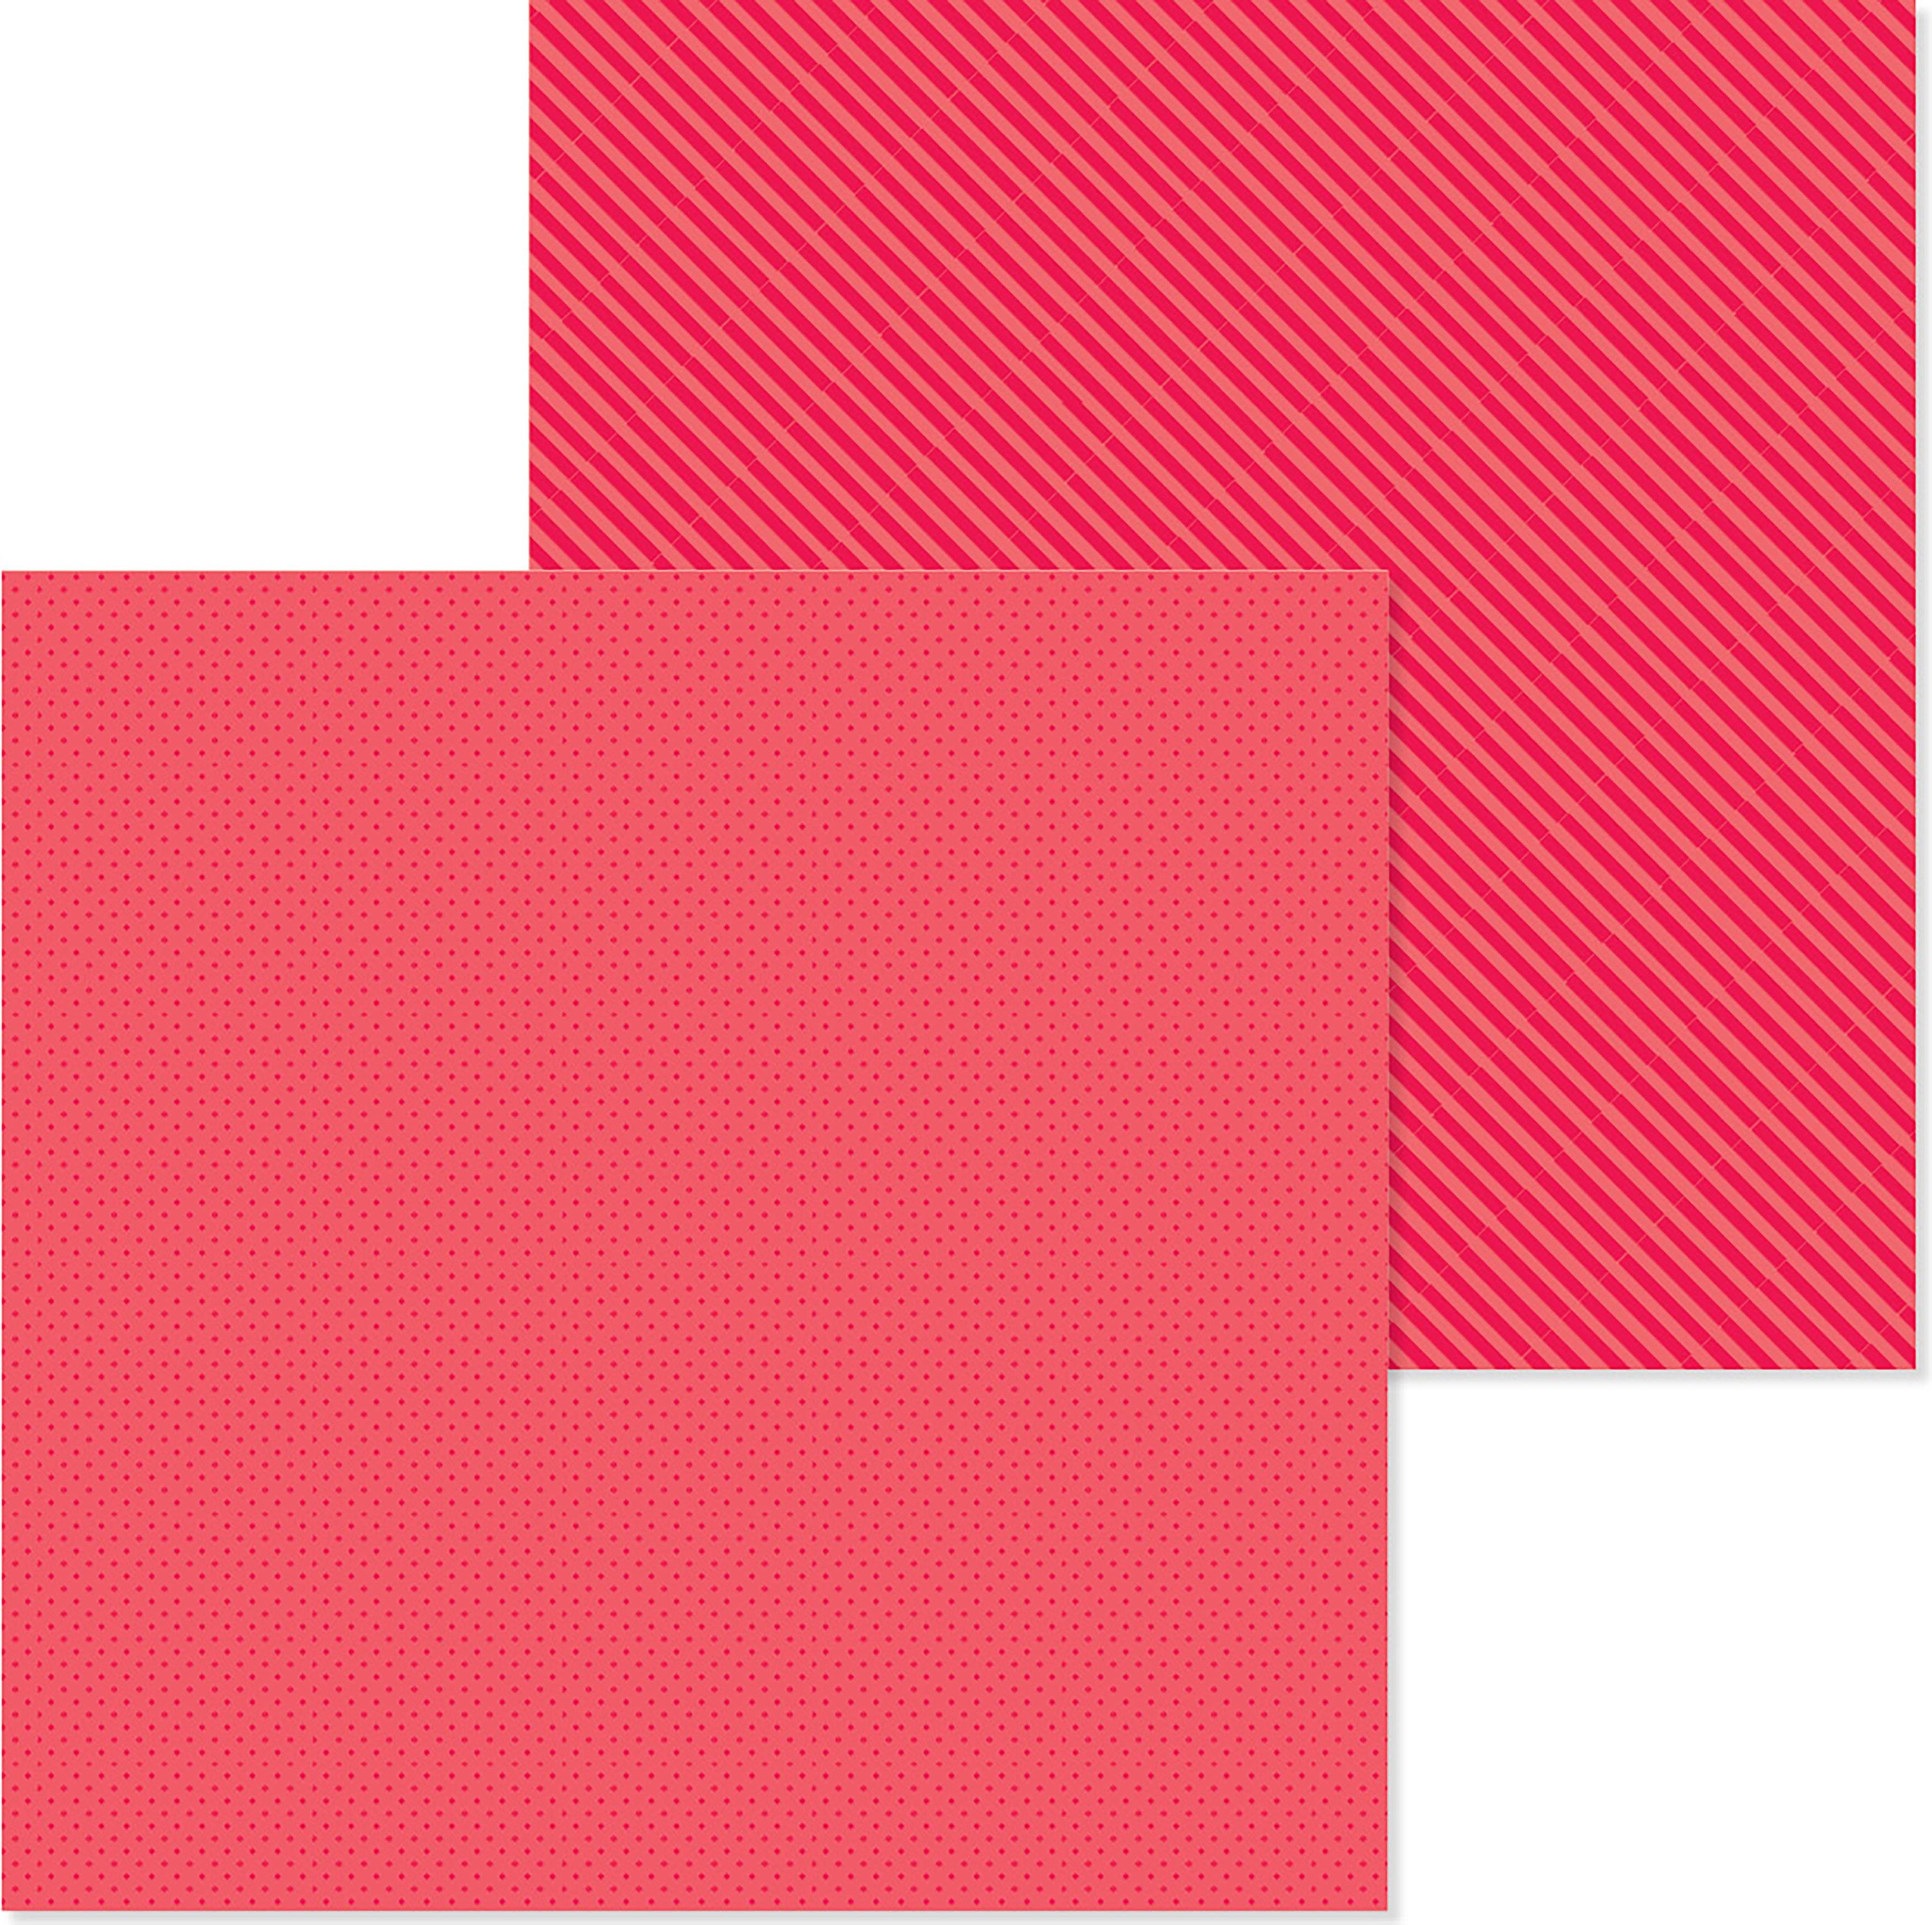 Doodlebug Petite Prints Dot/Stripe Cardstock 12X12-Ladybug